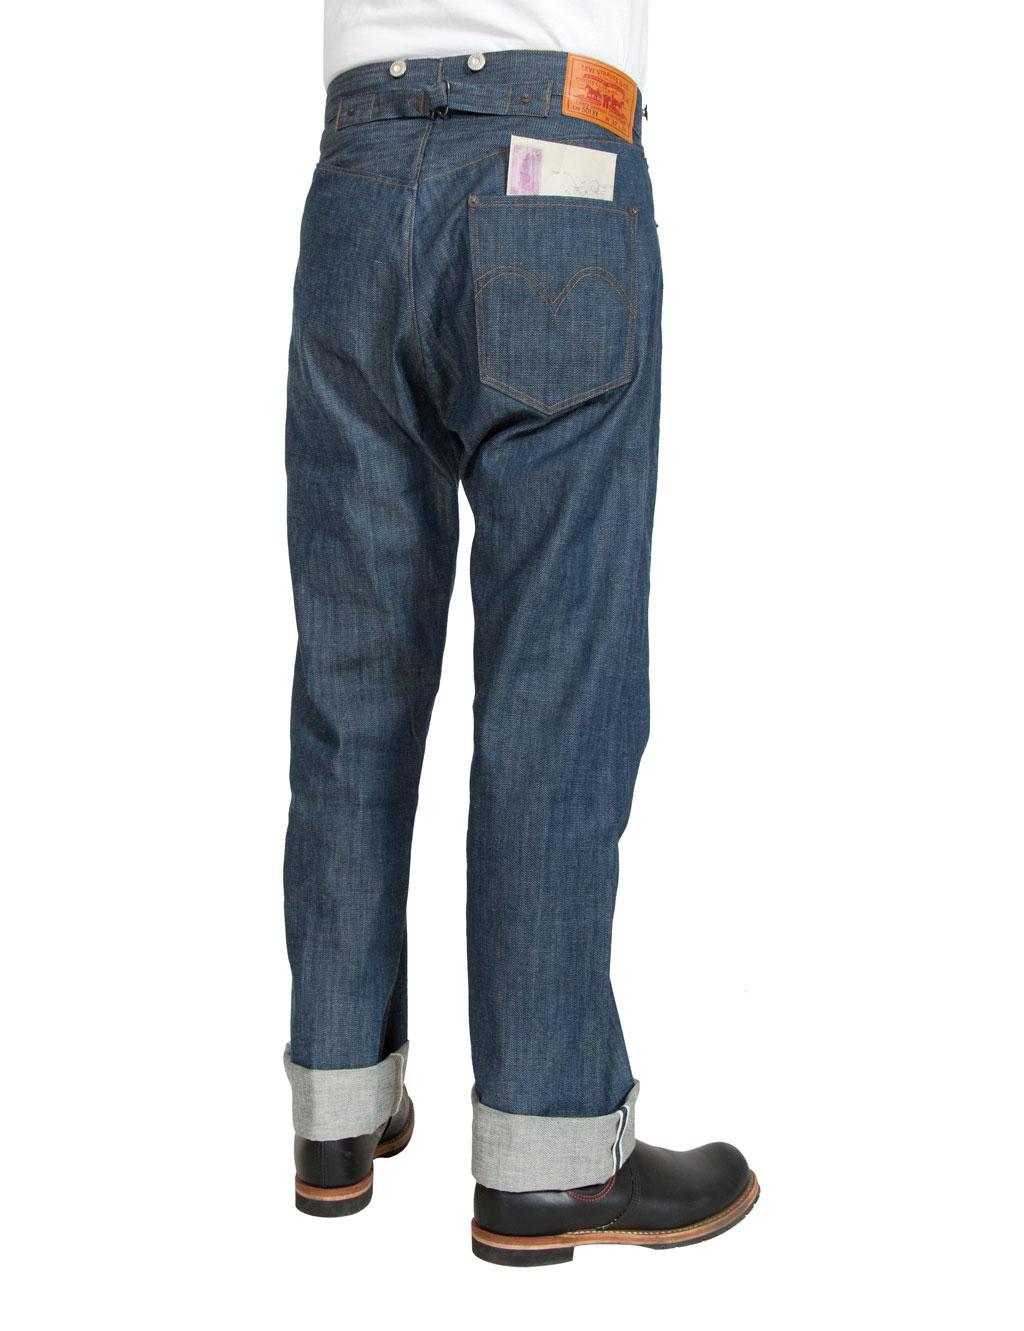 e27f4f518c0 levis-vintage-clothing-1890-501-jeans-rigid-0123.jpg